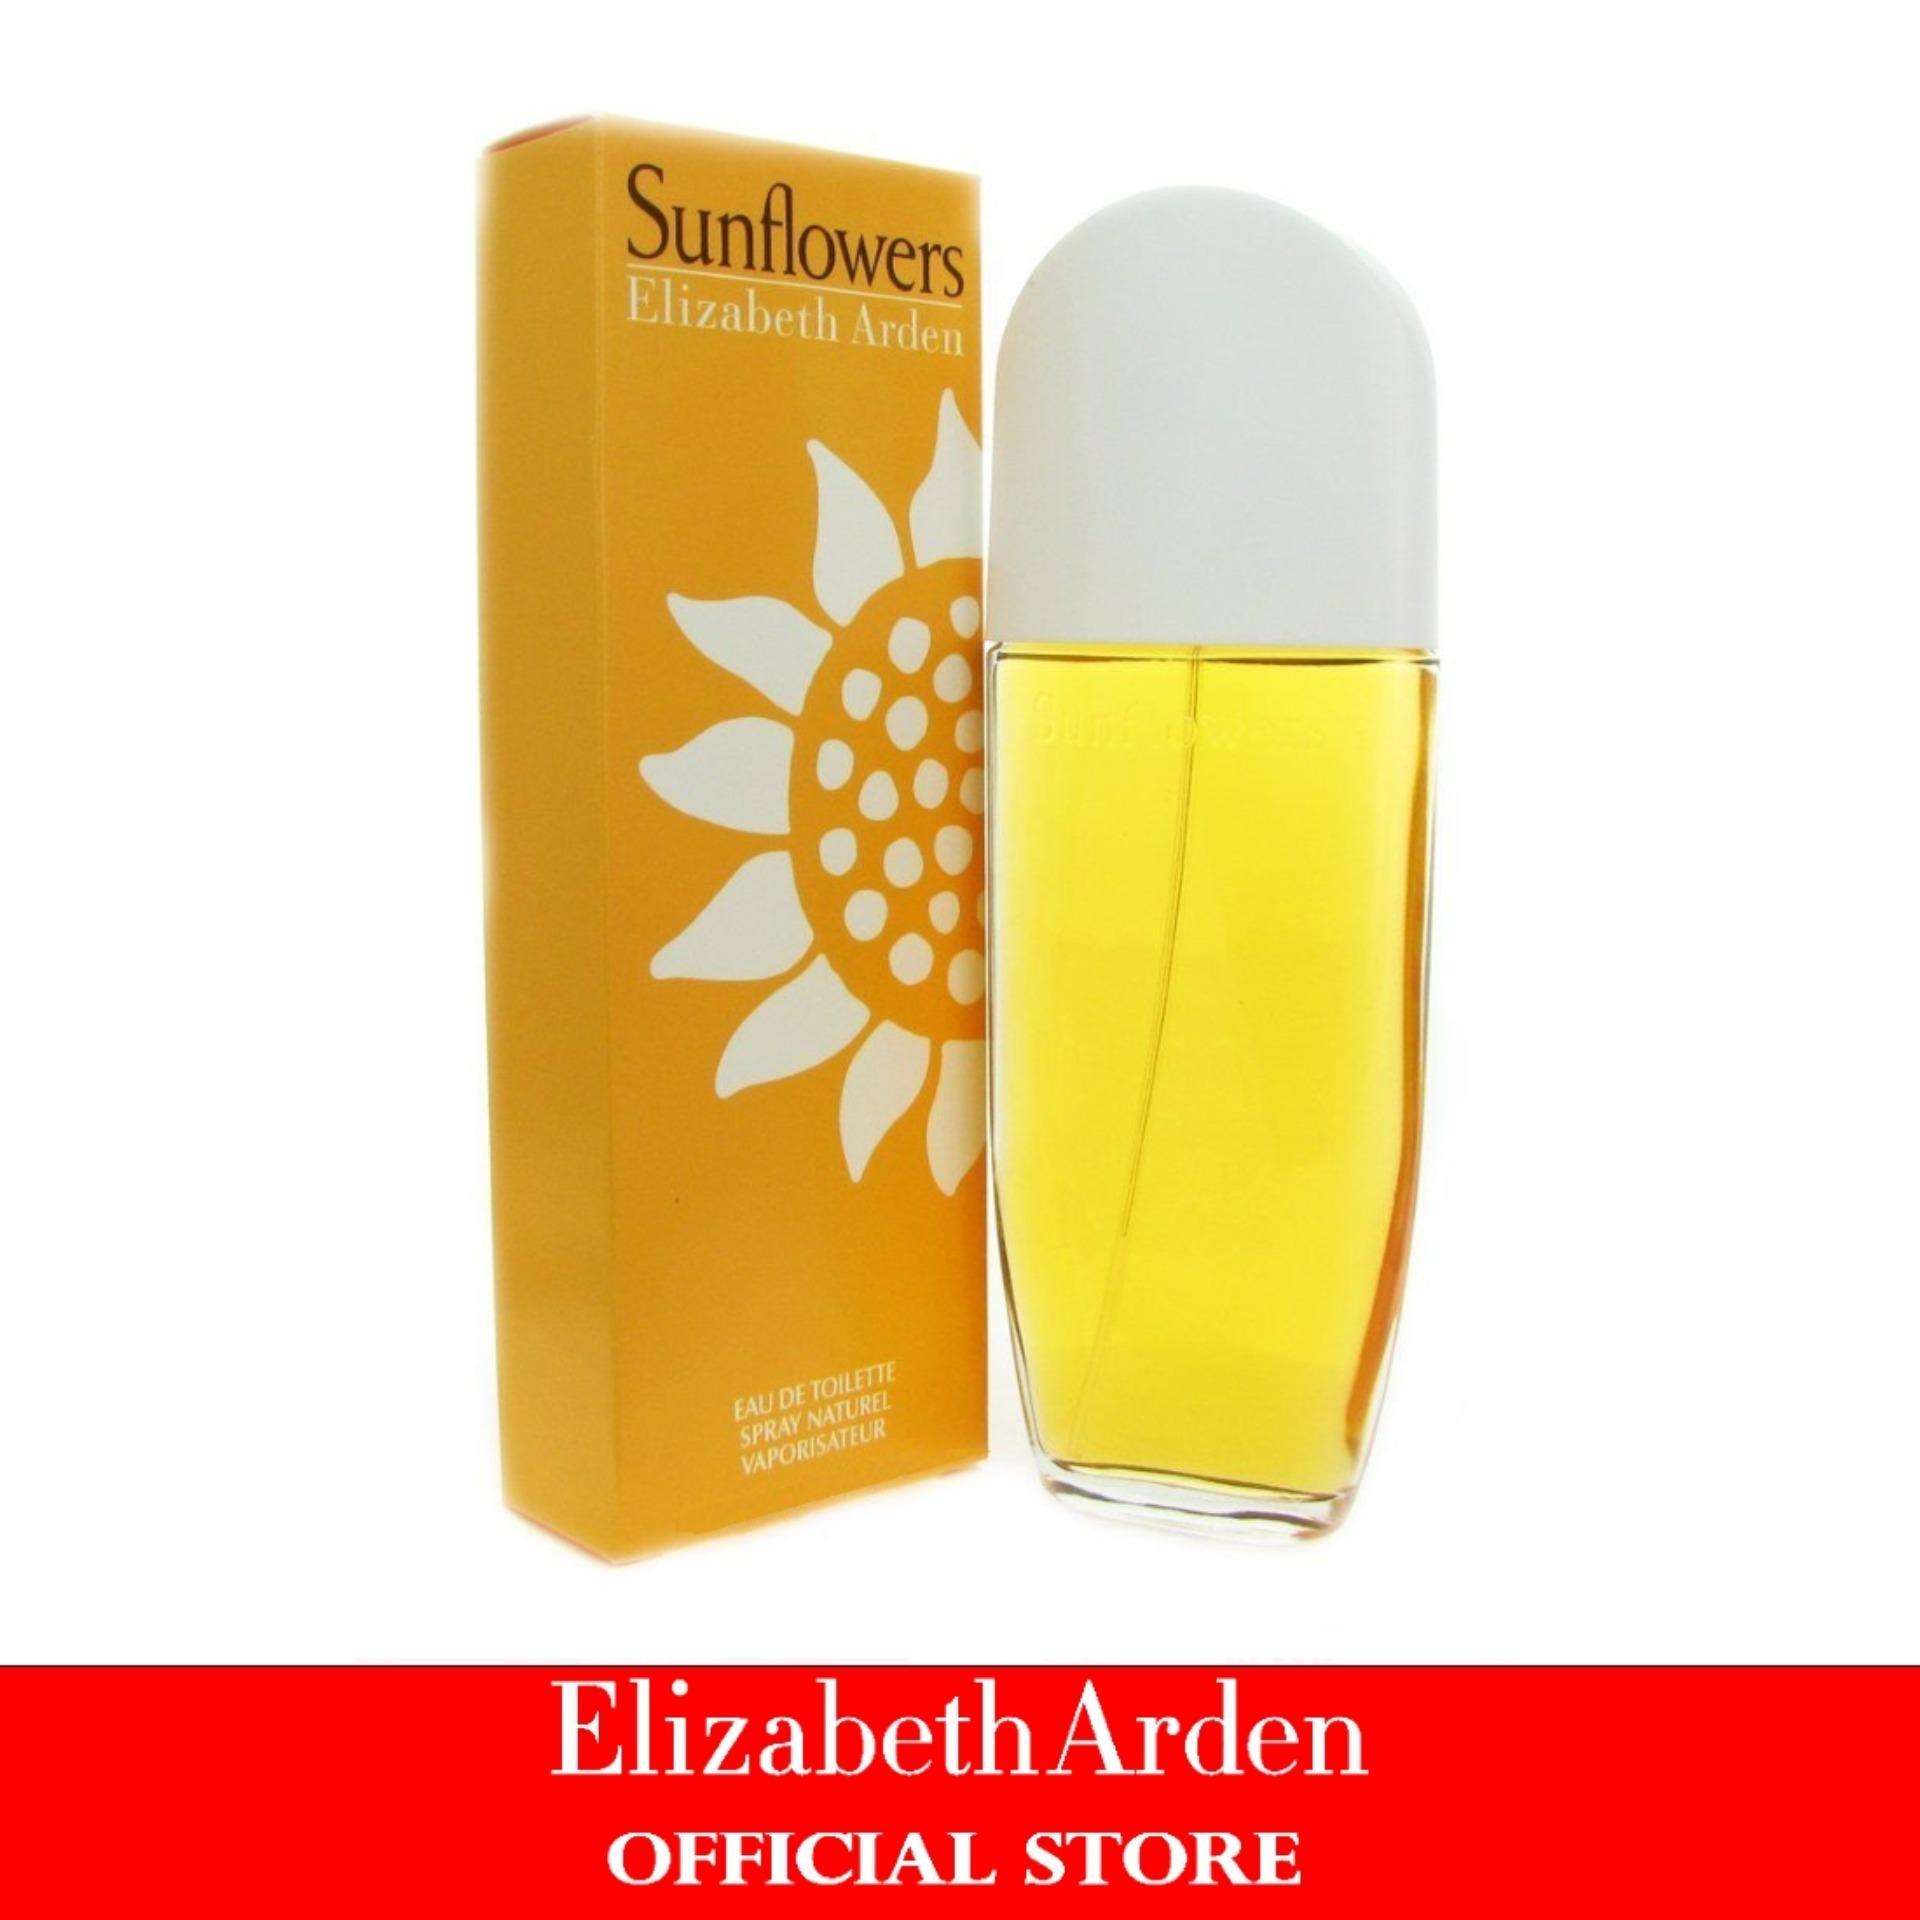 Price Elizabeth Arden Sunflowers Eau De Toilette 3 3 Oz Spray Elizabeth Arden Online